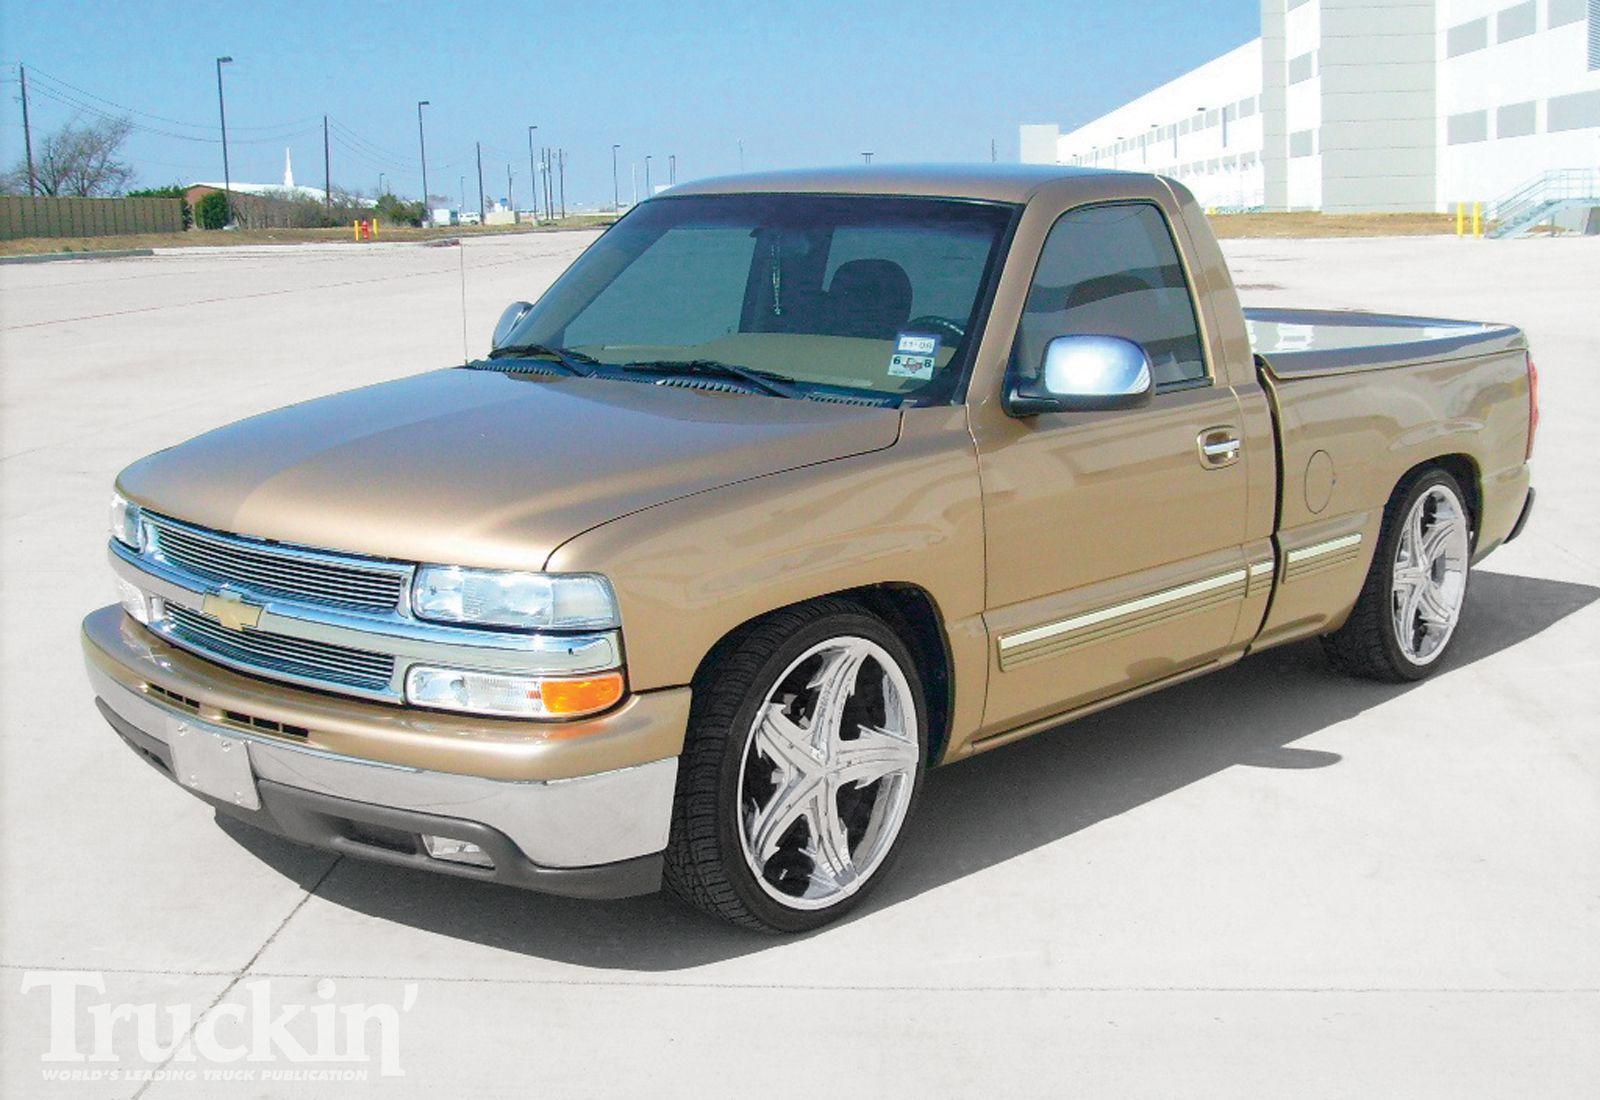 2000 Chevy Silverado Parts And Accessories In 2020 Custom Chevy